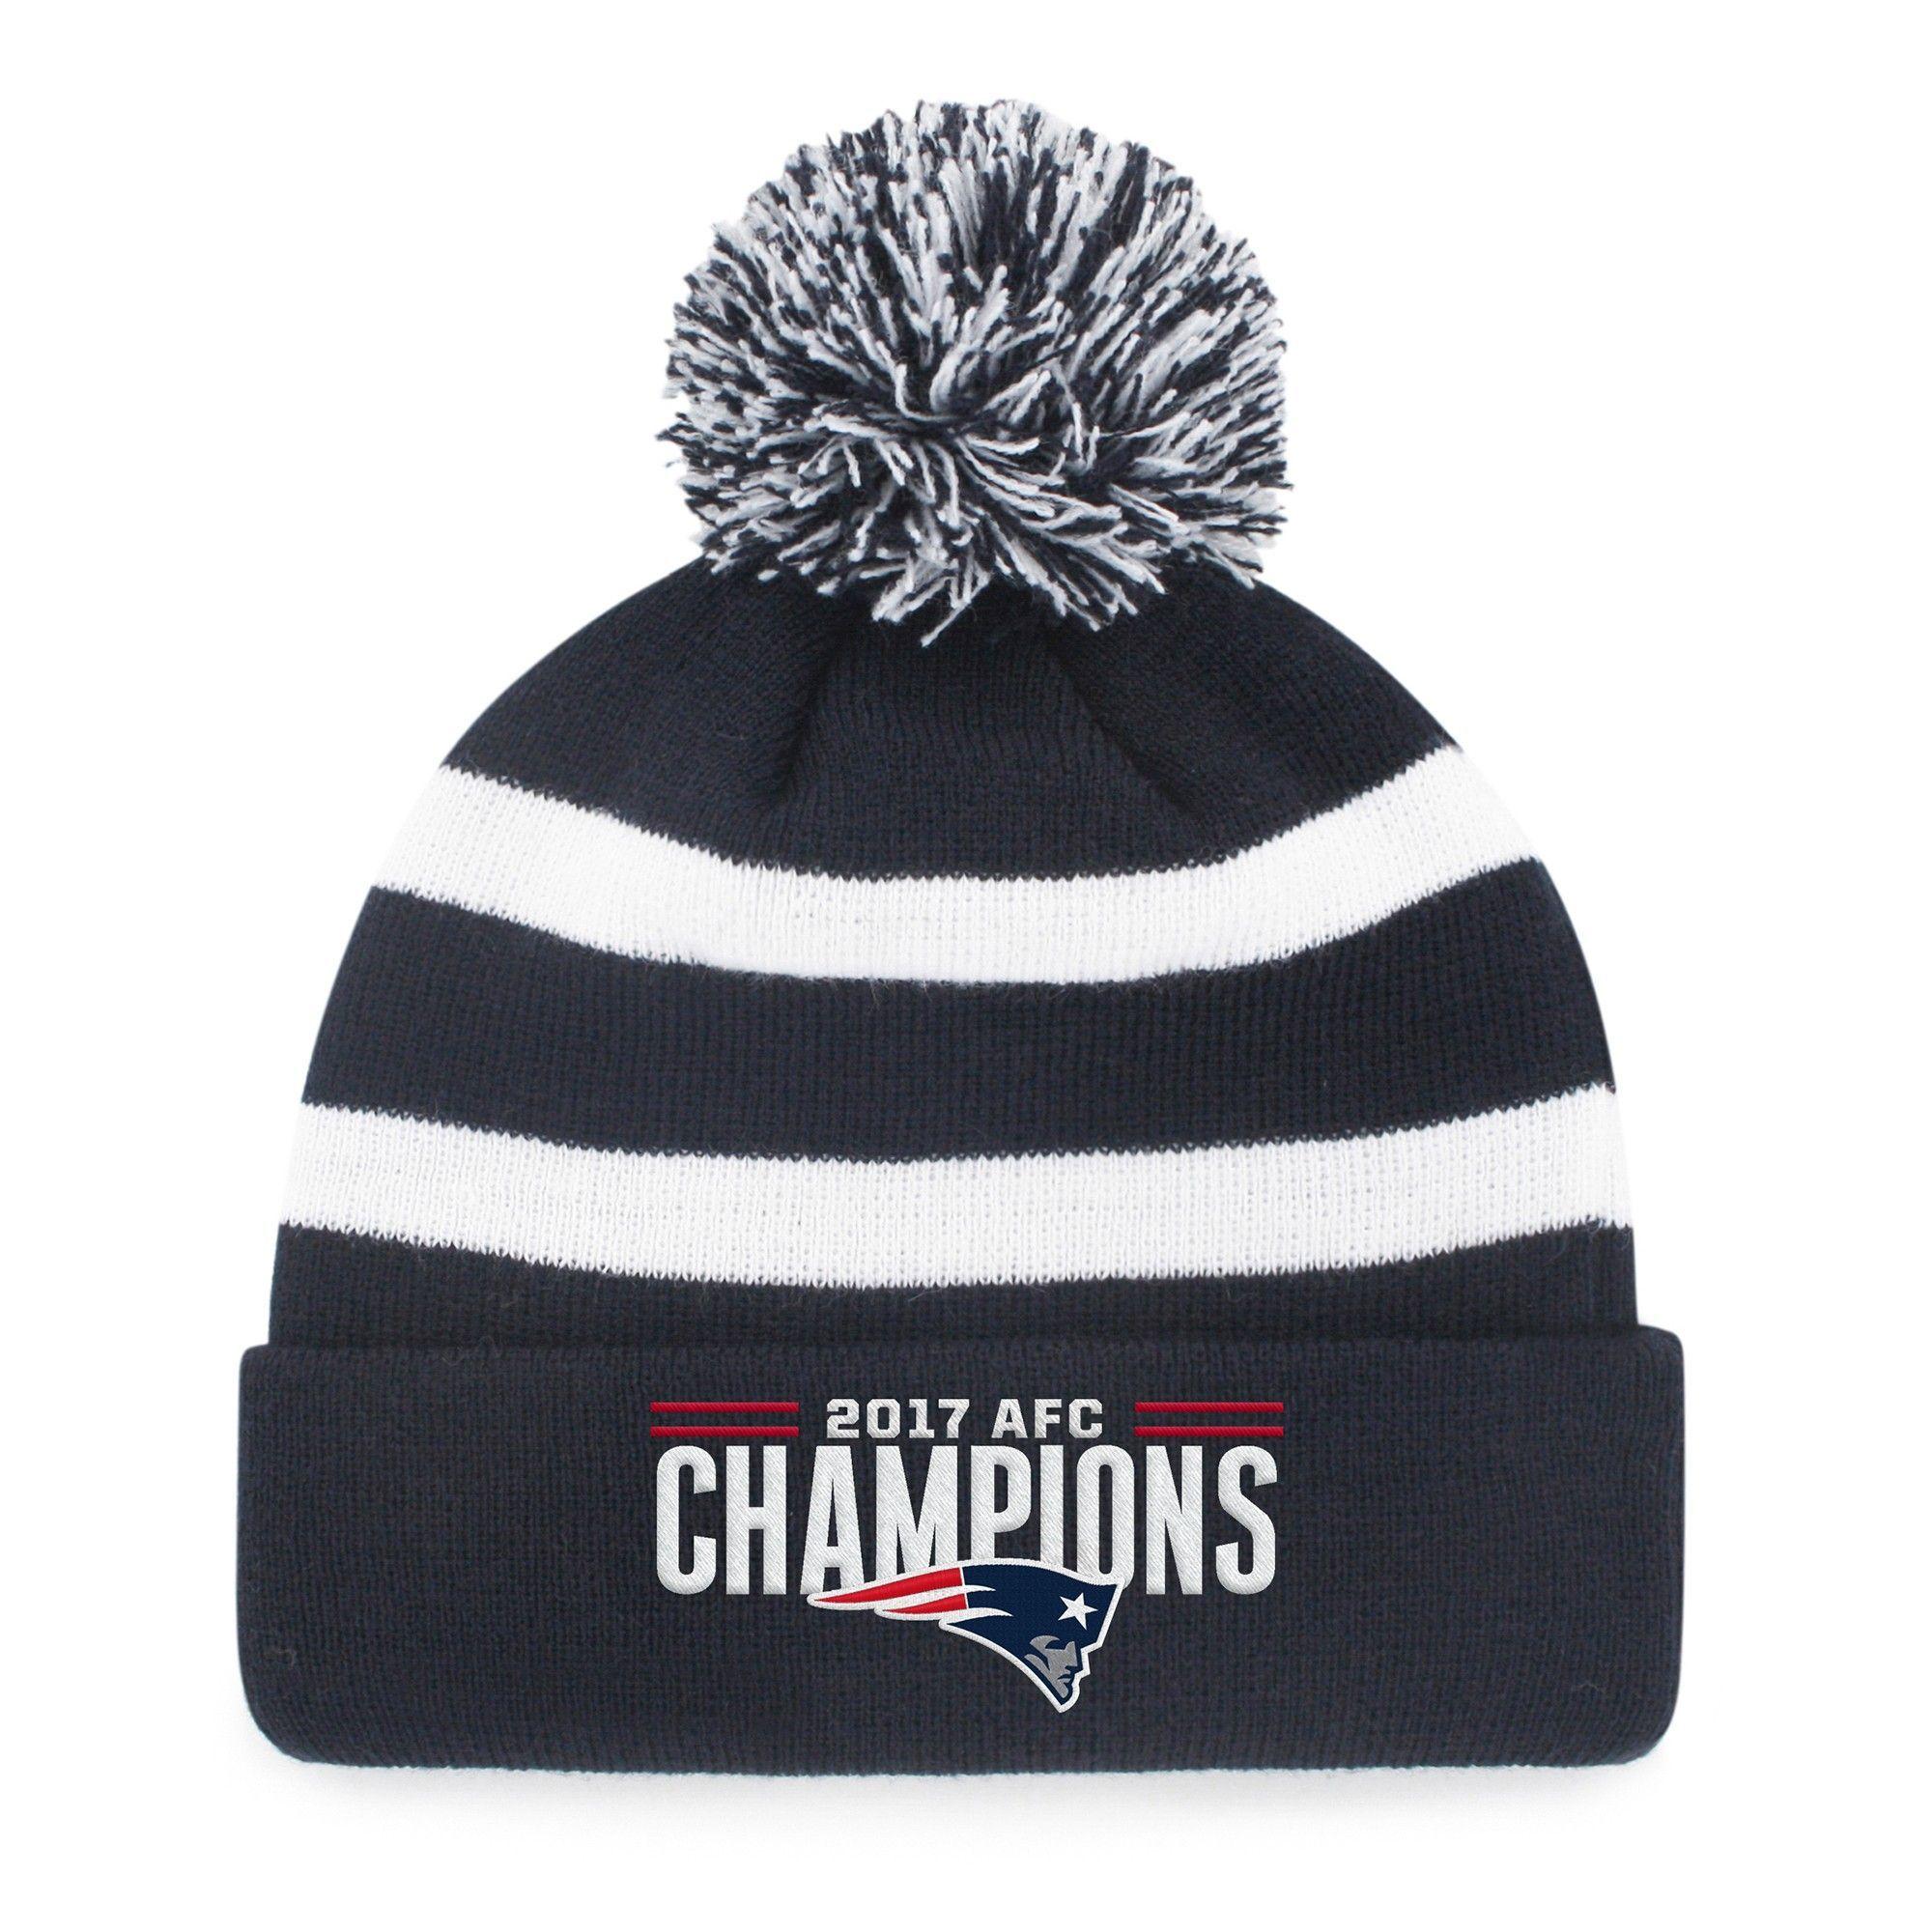 087ad3f87b3 NFL Super Bowl 52 Philadelphia Eagles Blackball Knit Hat with Pom ...